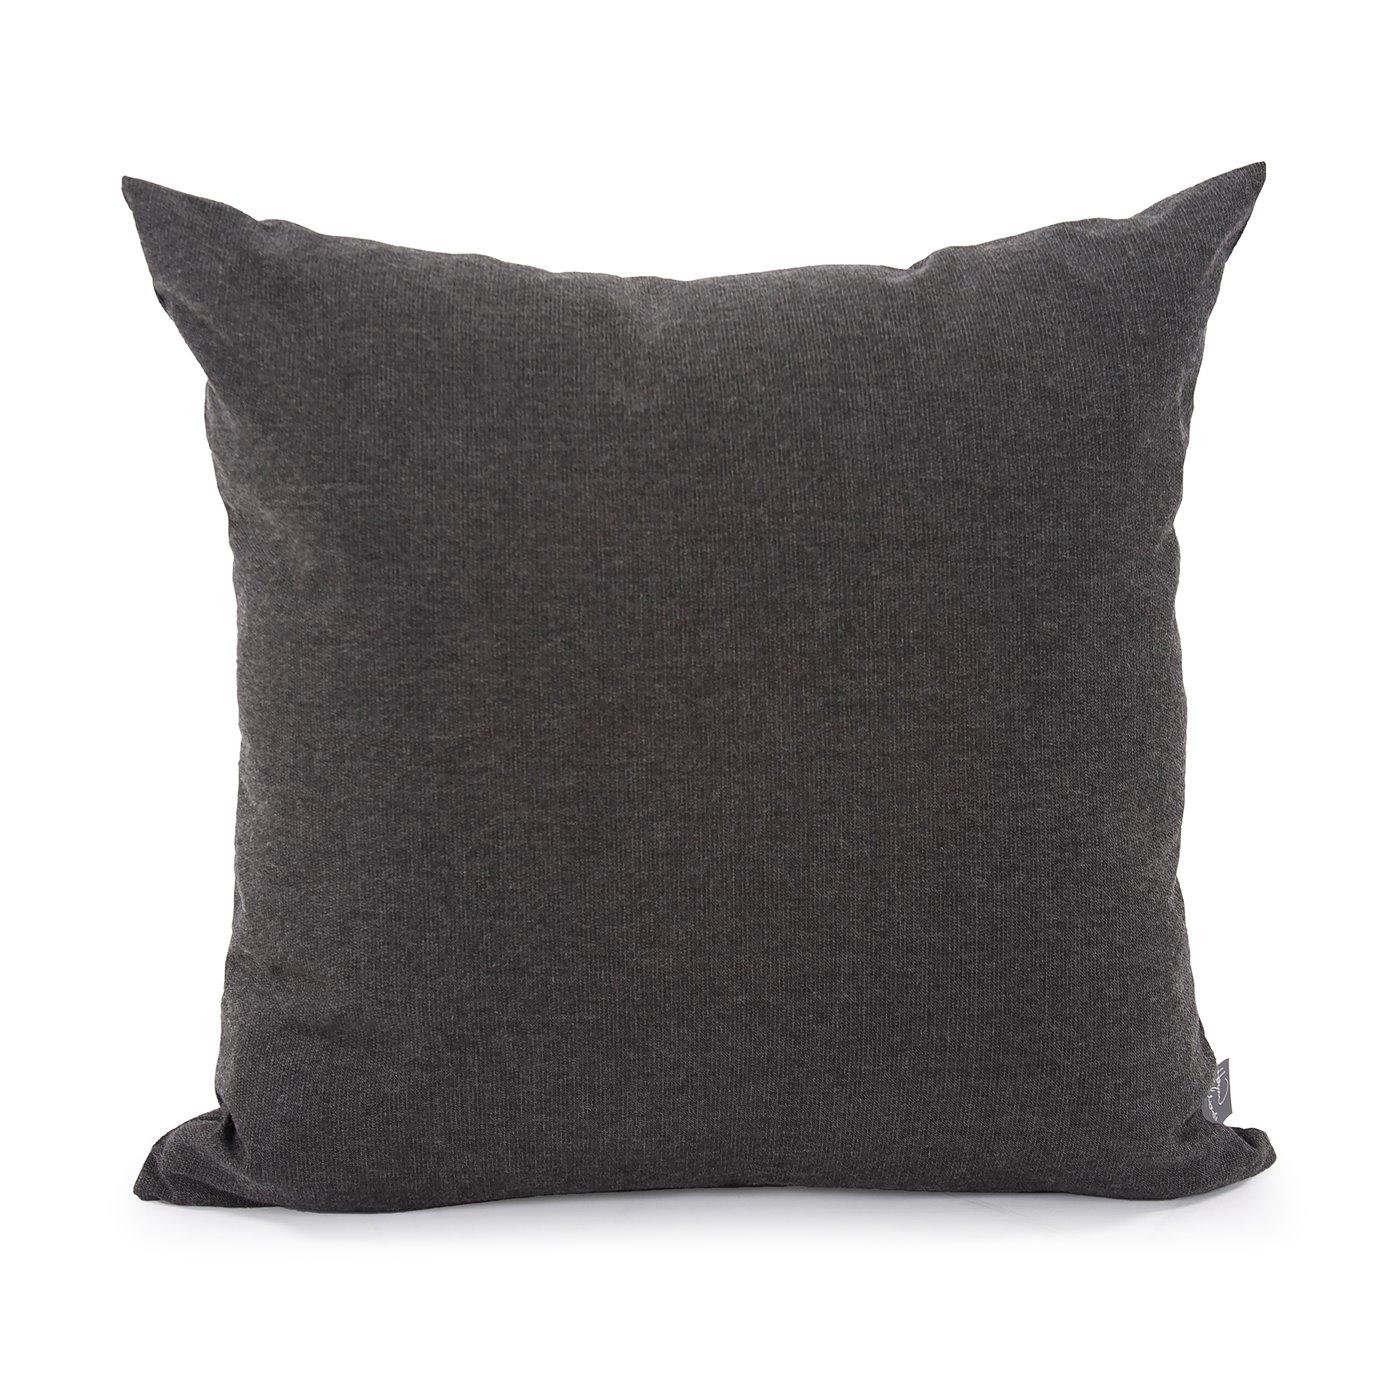 "Howard Elliott 20"" x 20"" Pillow Outdoor Sunbrella Seascape Charcoal"